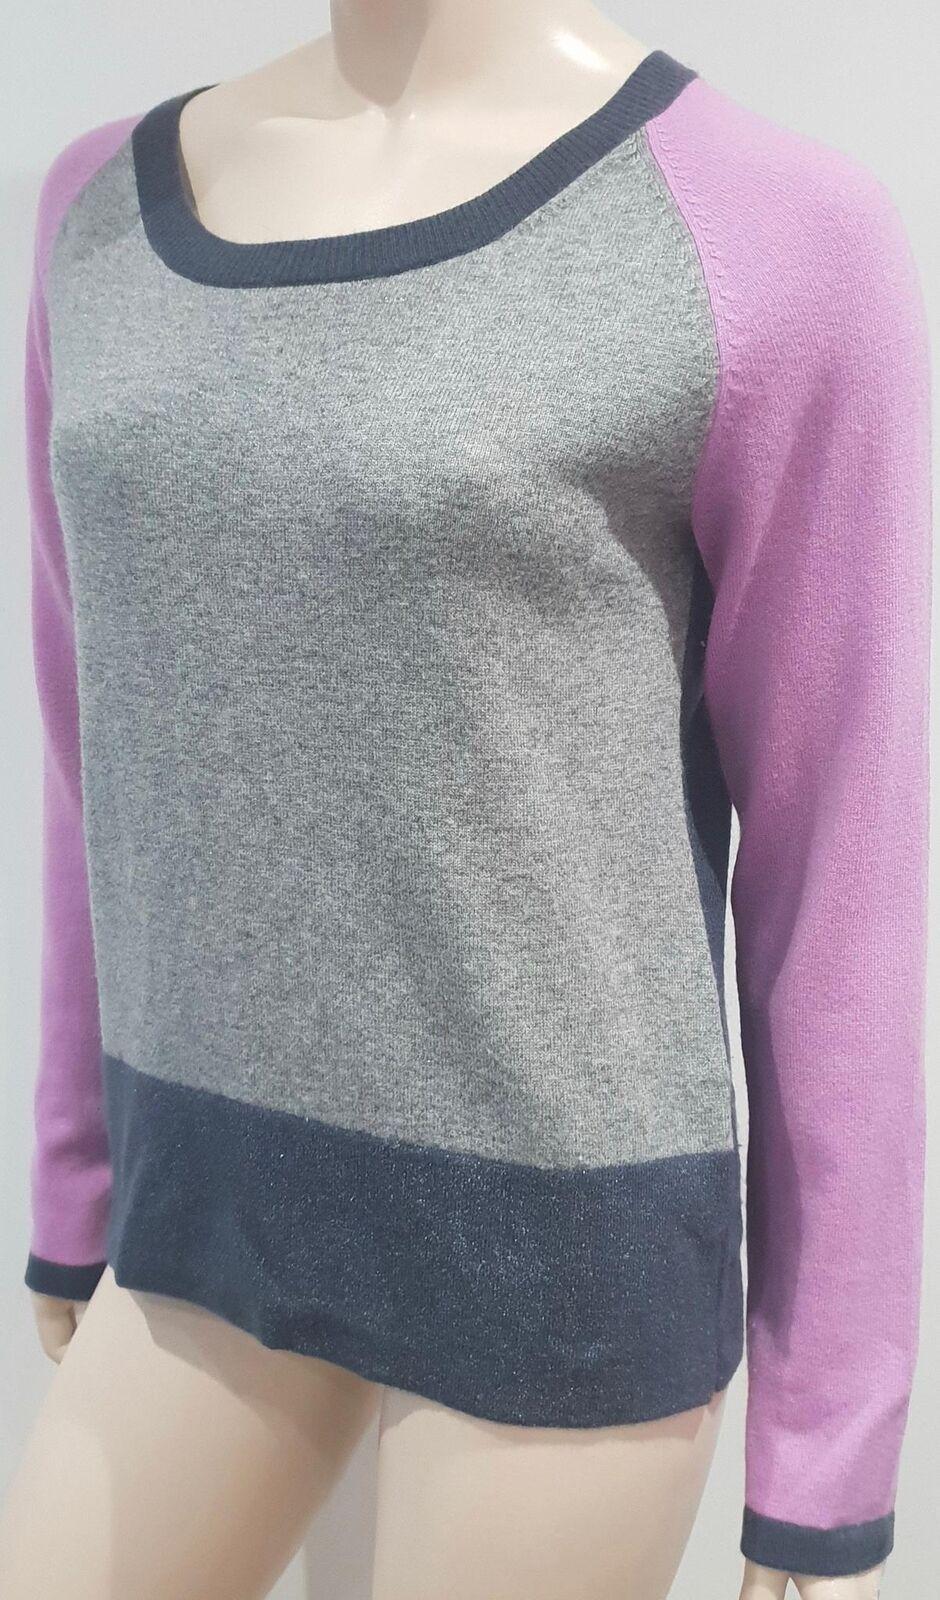 LAUREL Pink Charcoal Grey Metallic Wool Cashmere Knitwear Jumper Sweater Top 10